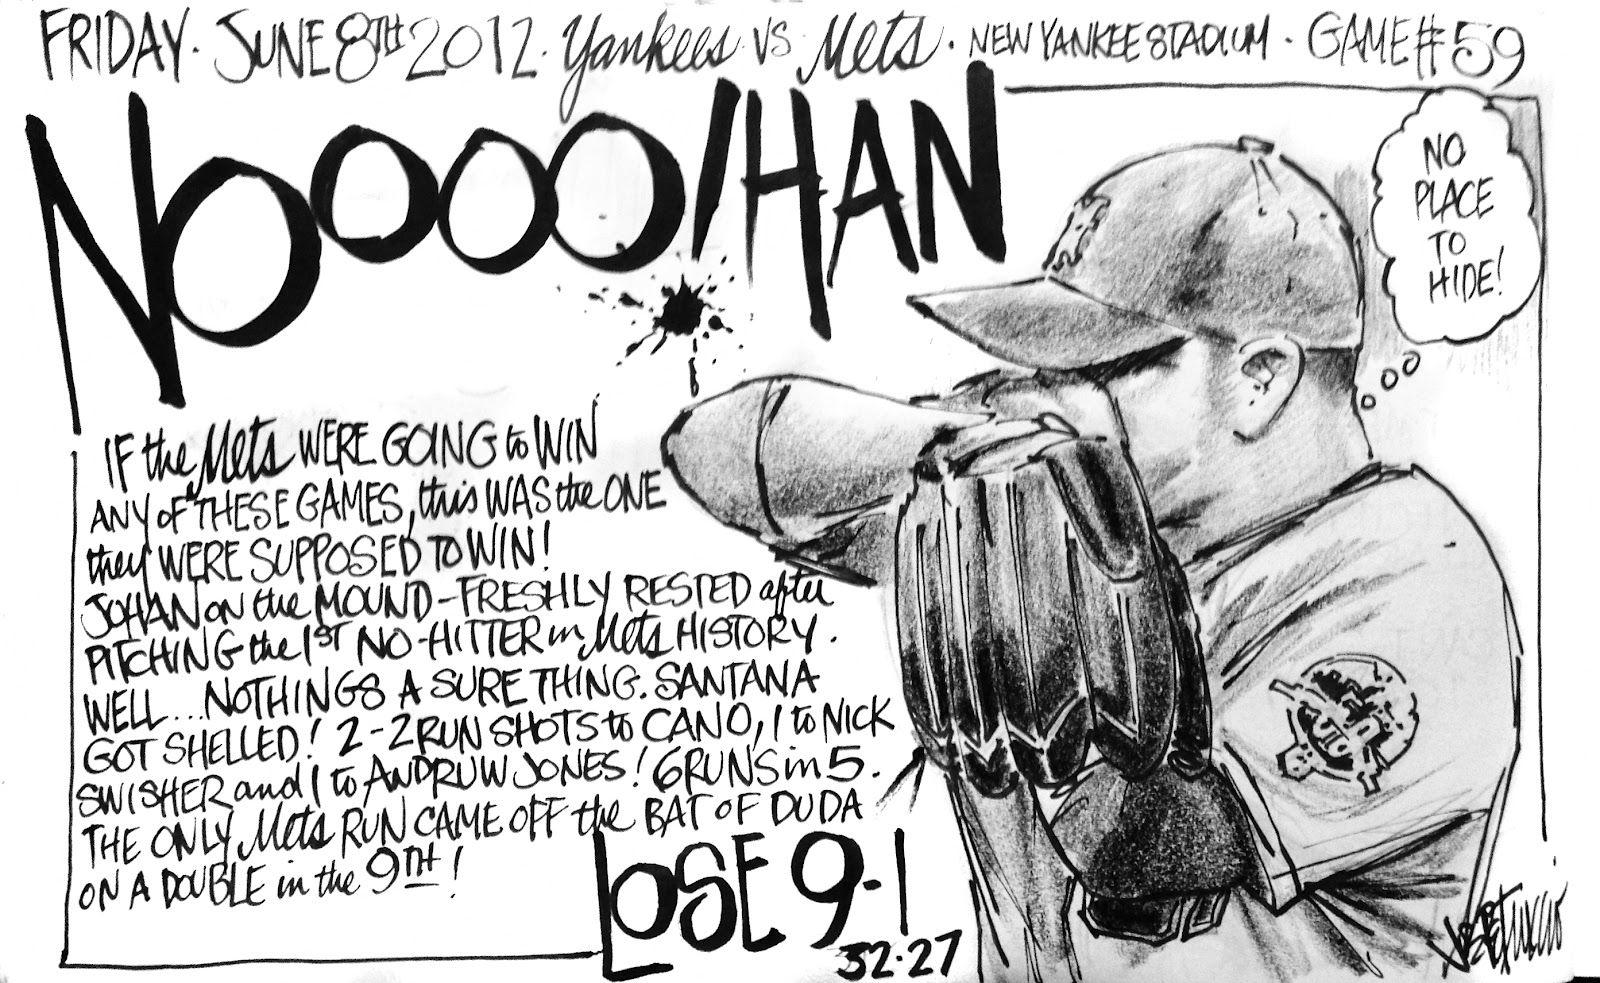 My Mets Journal